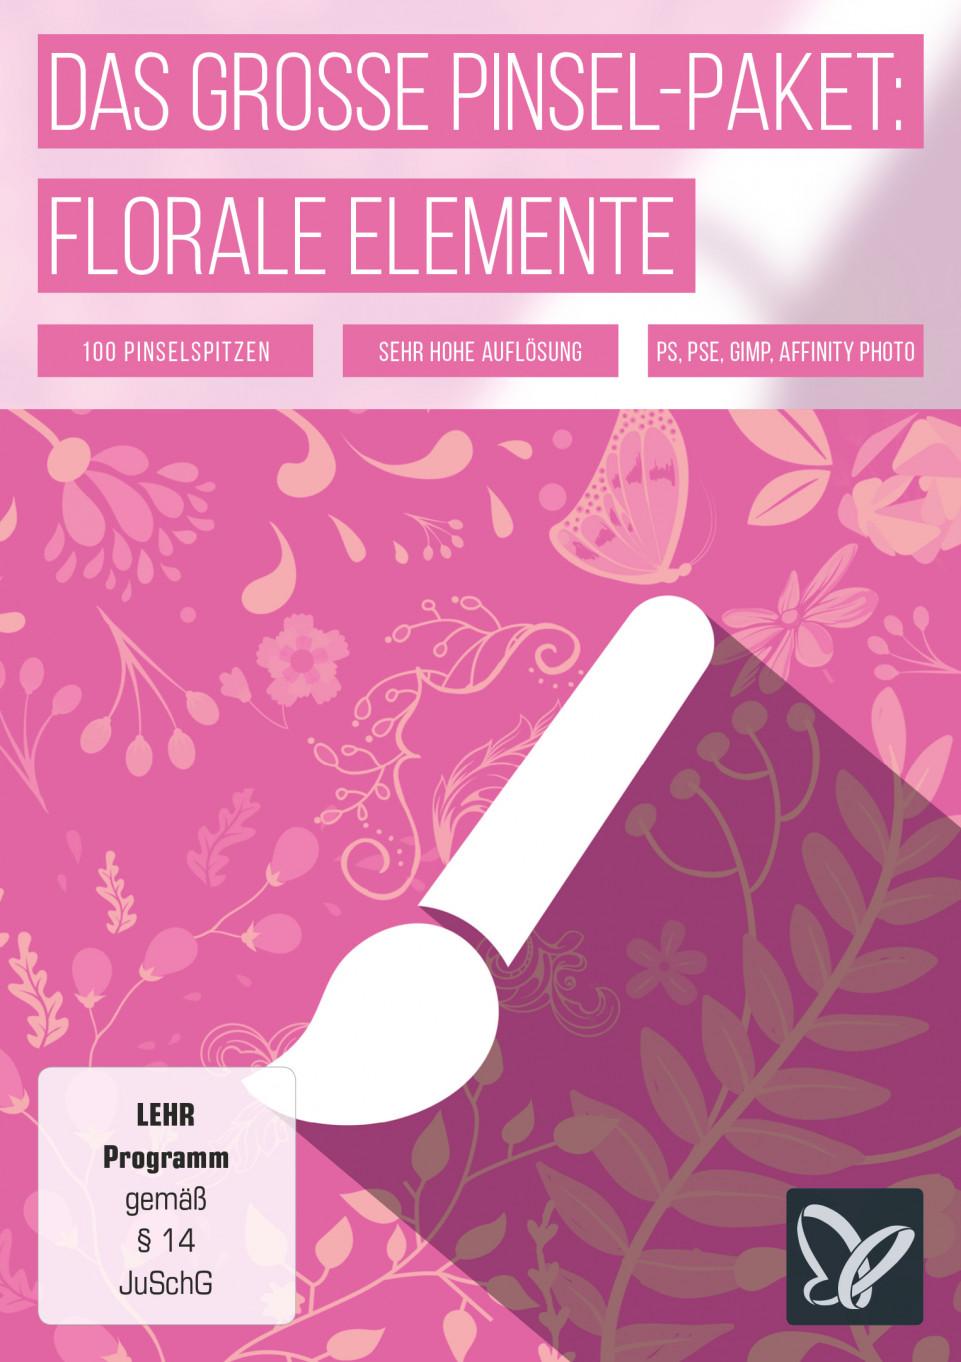 Das große Pinsel-Paket – florale Elemente